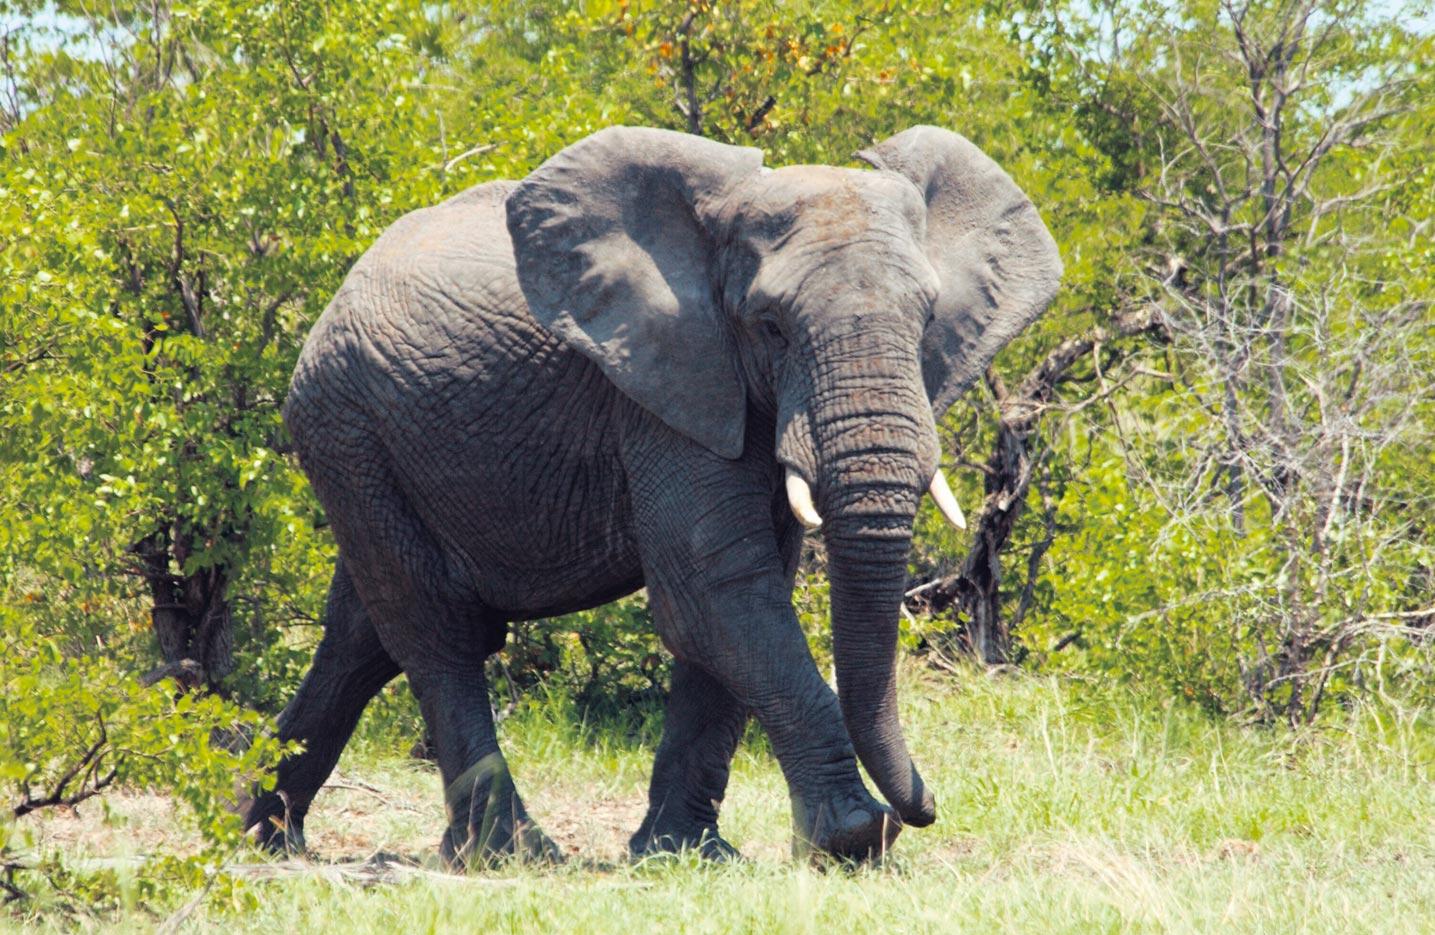 afrikanischer elefant tier lexikon wiki fandom powered. Black Bedroom Furniture Sets. Home Design Ideas